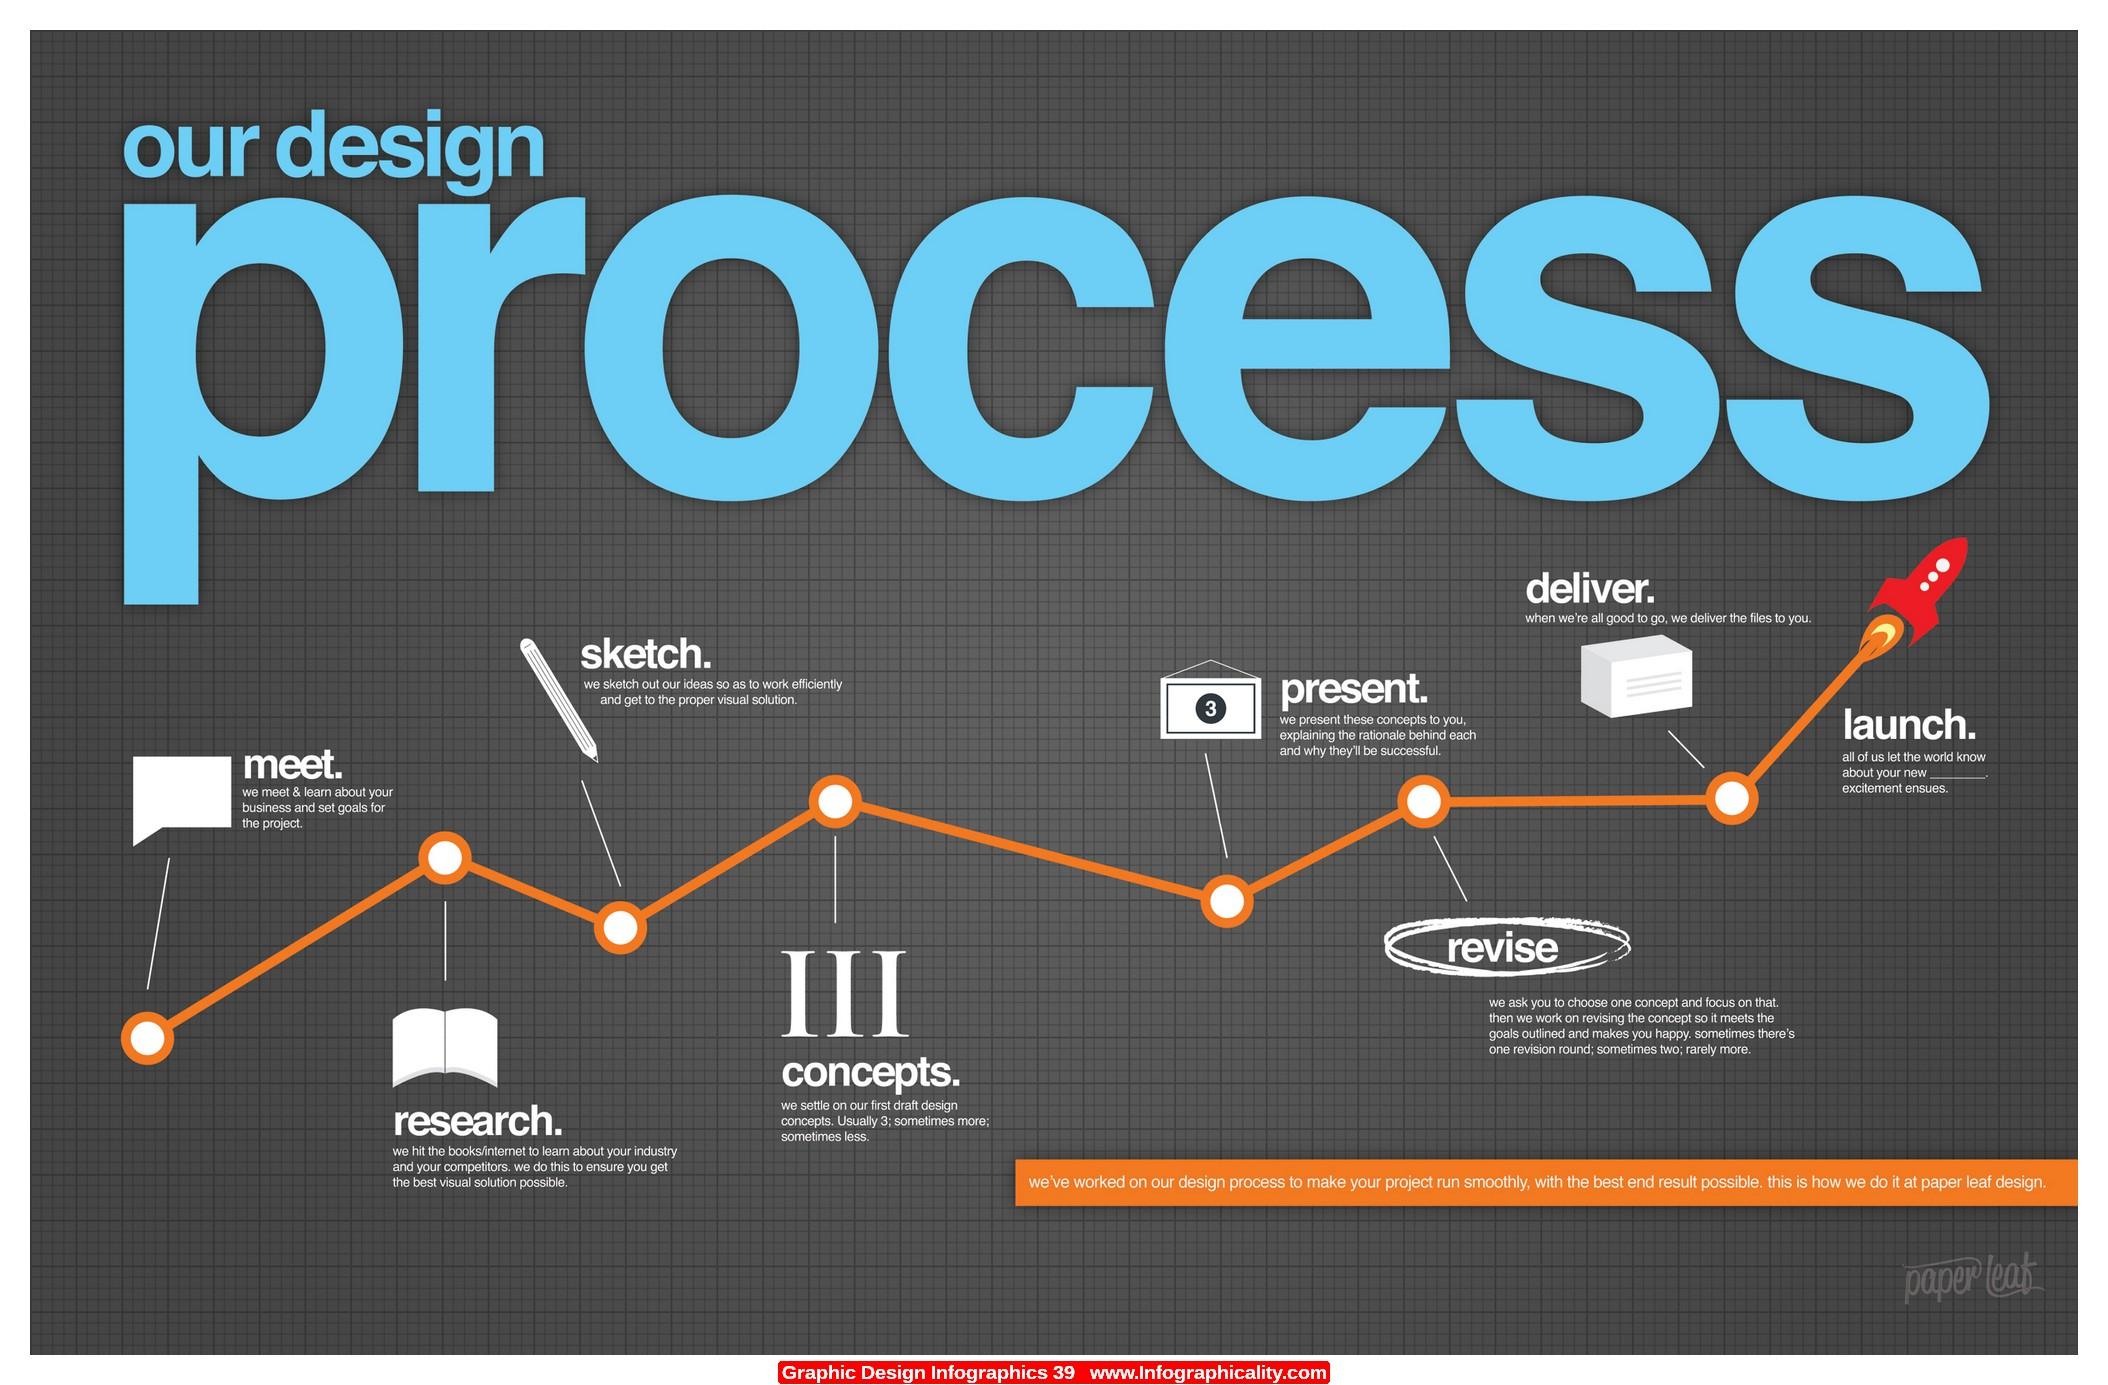 14 Infographic Graphic Design Principles Images